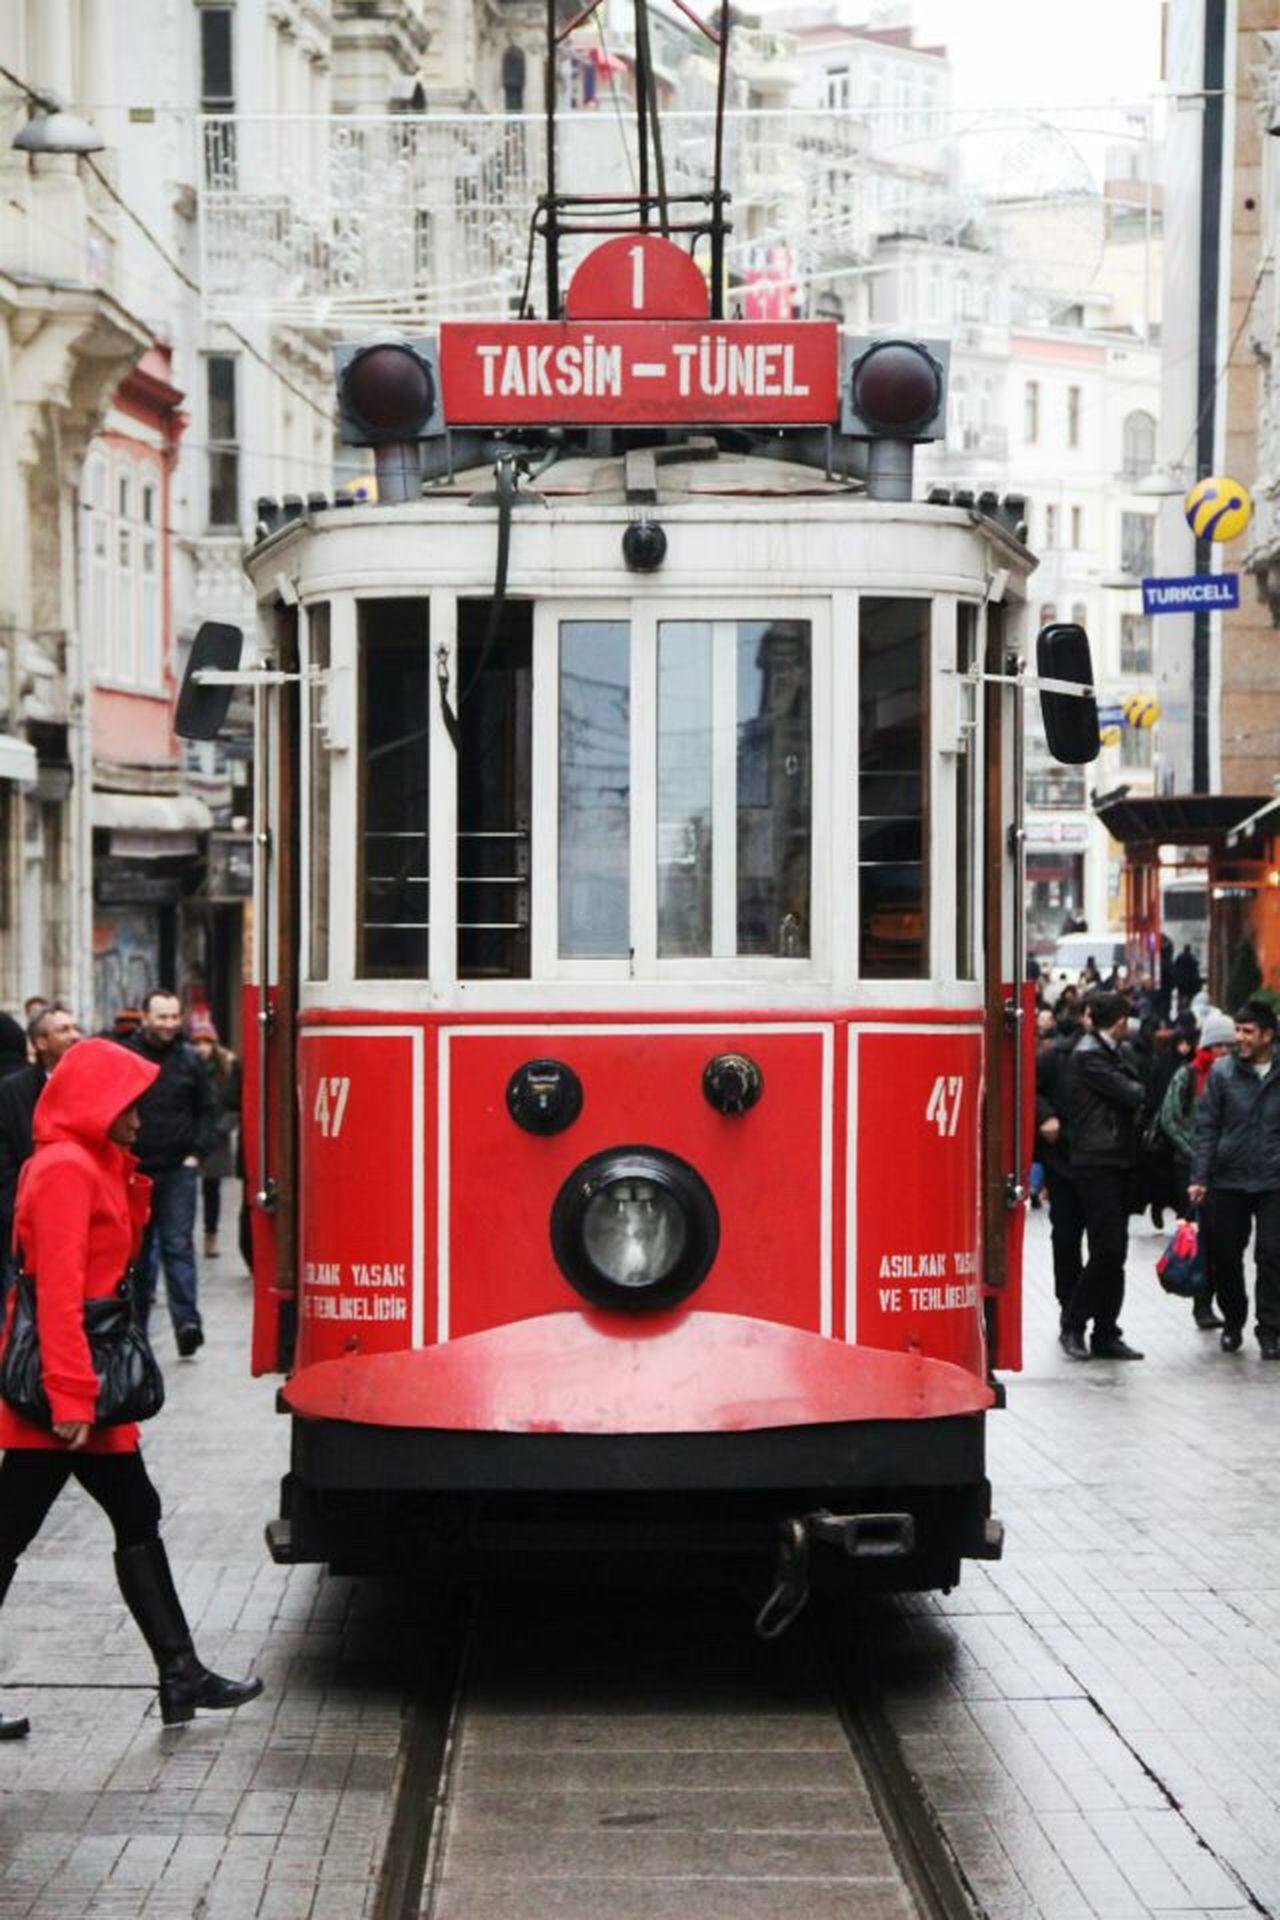 What The Bus? Bus Tram Zug Public Transportation Transportation Taksim Istanbul Red